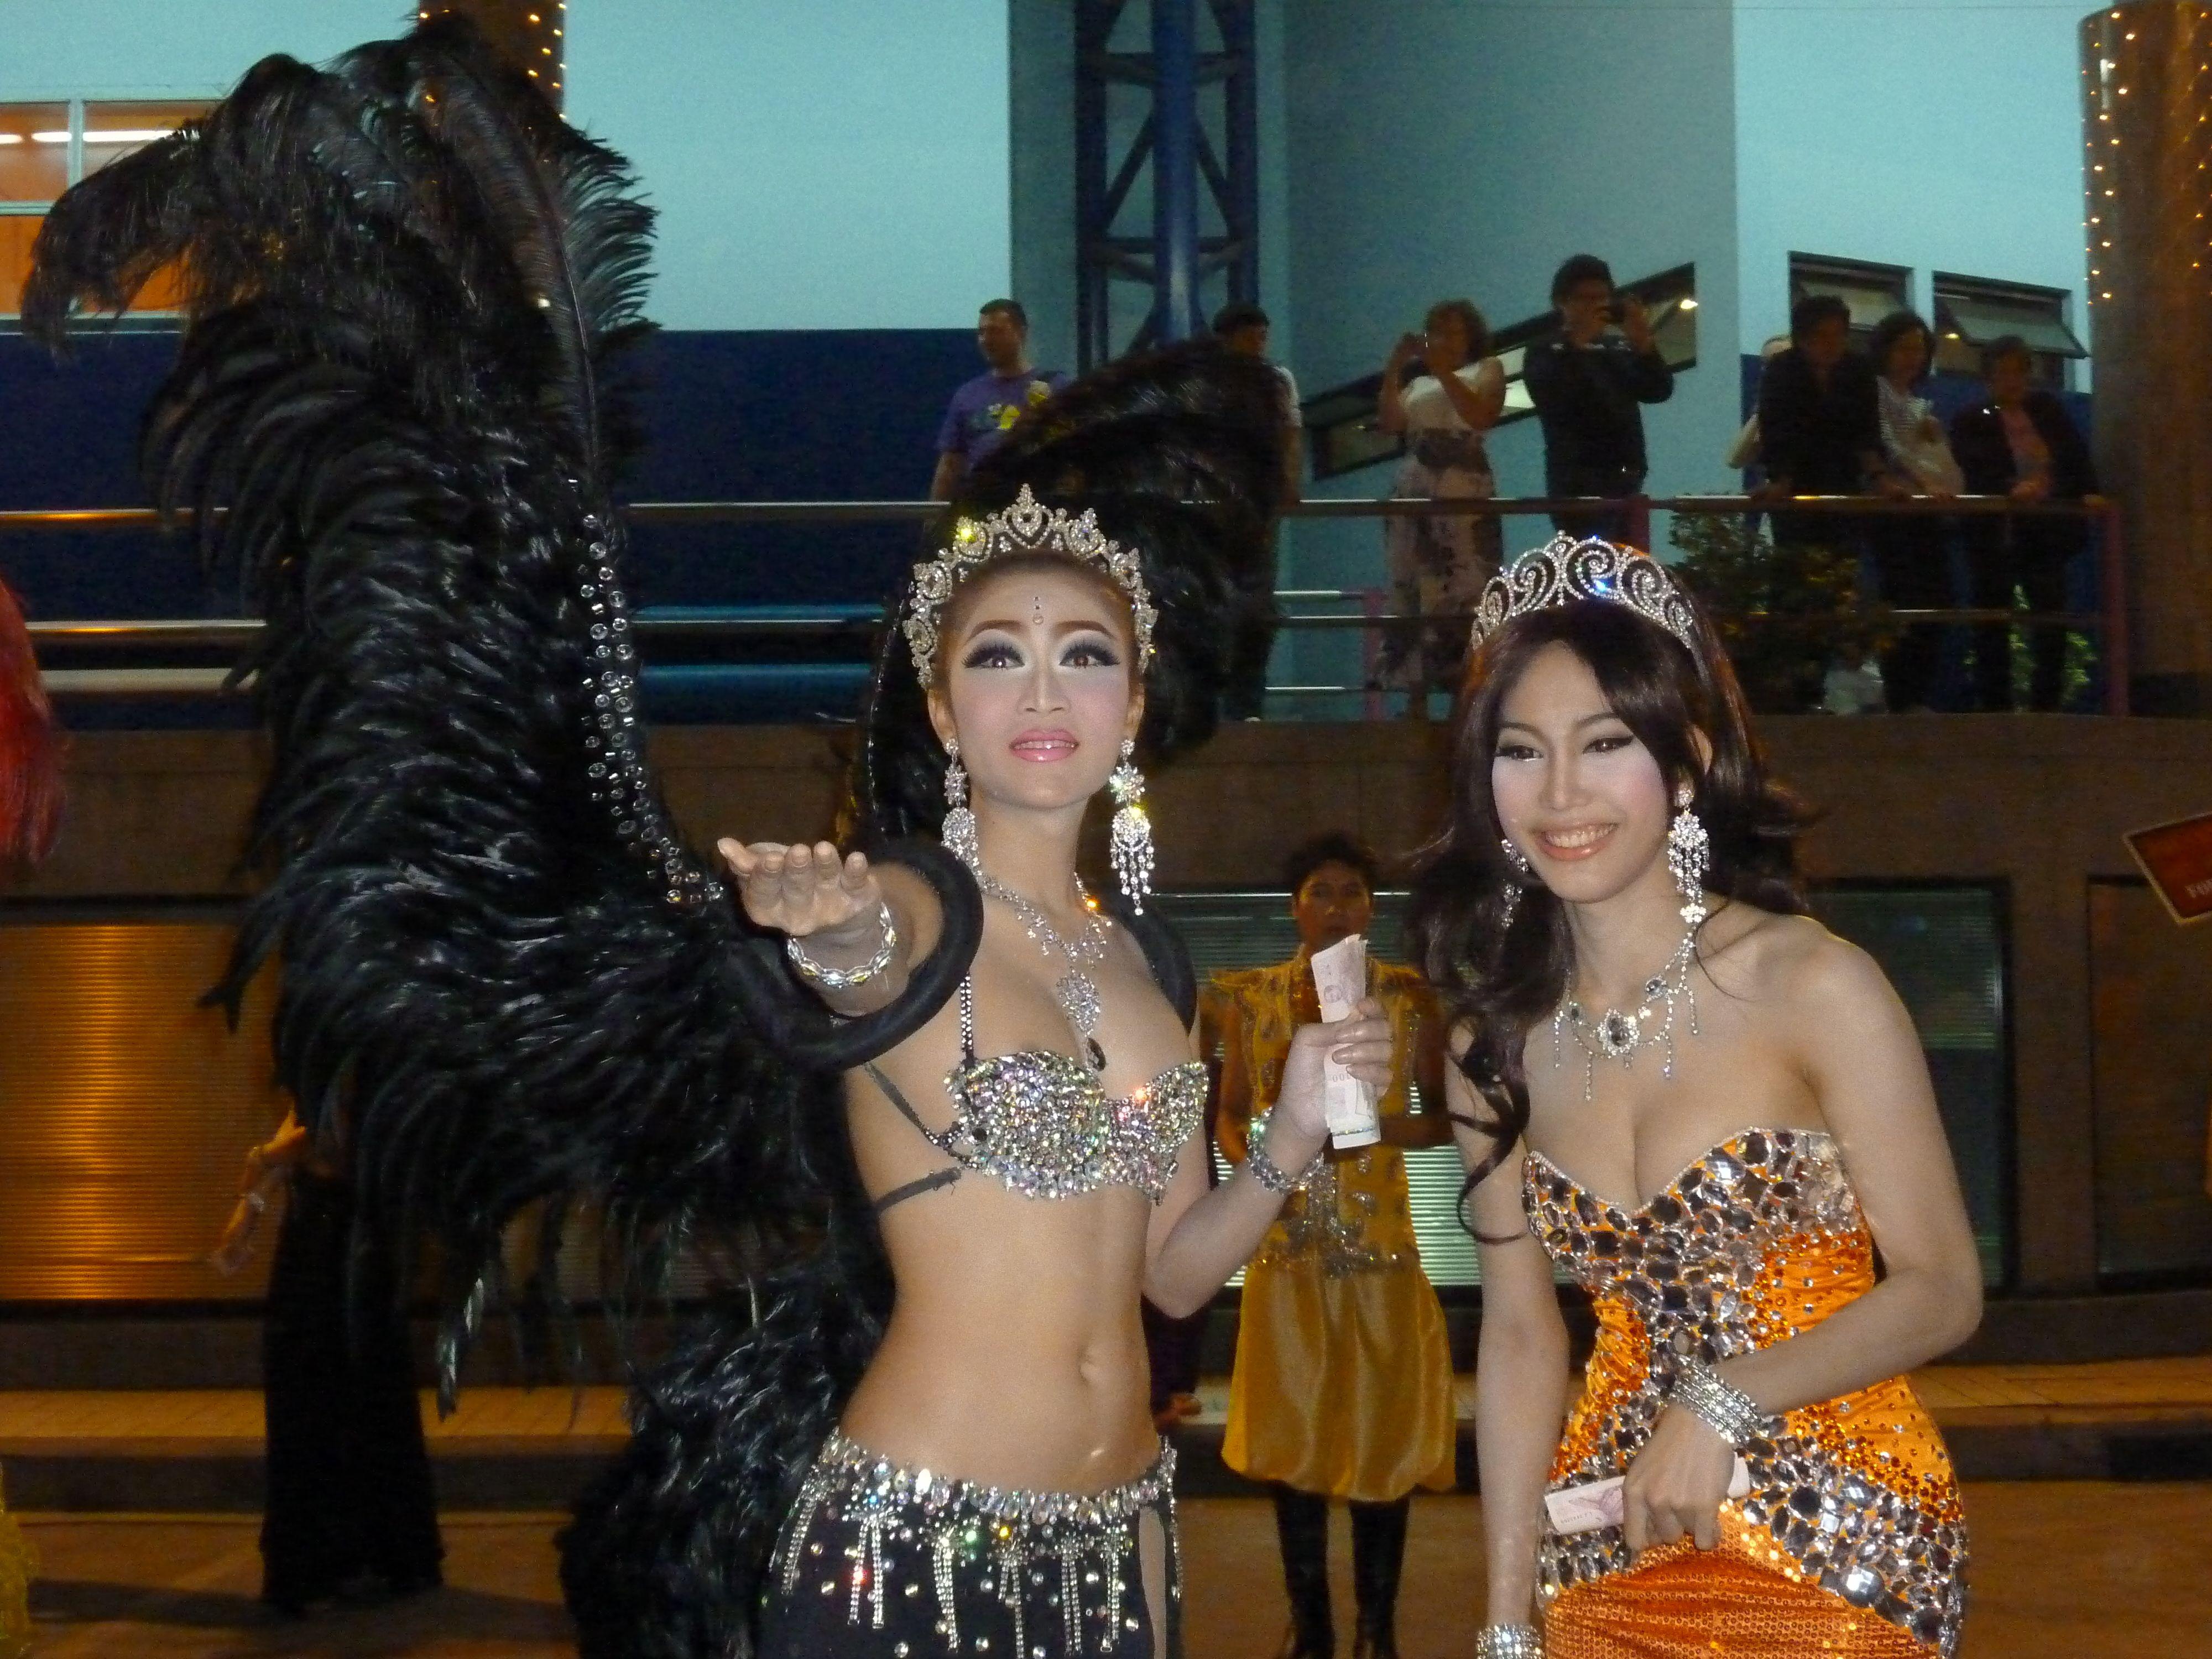 Tiffany's ladyboy cabaret show in pattaya